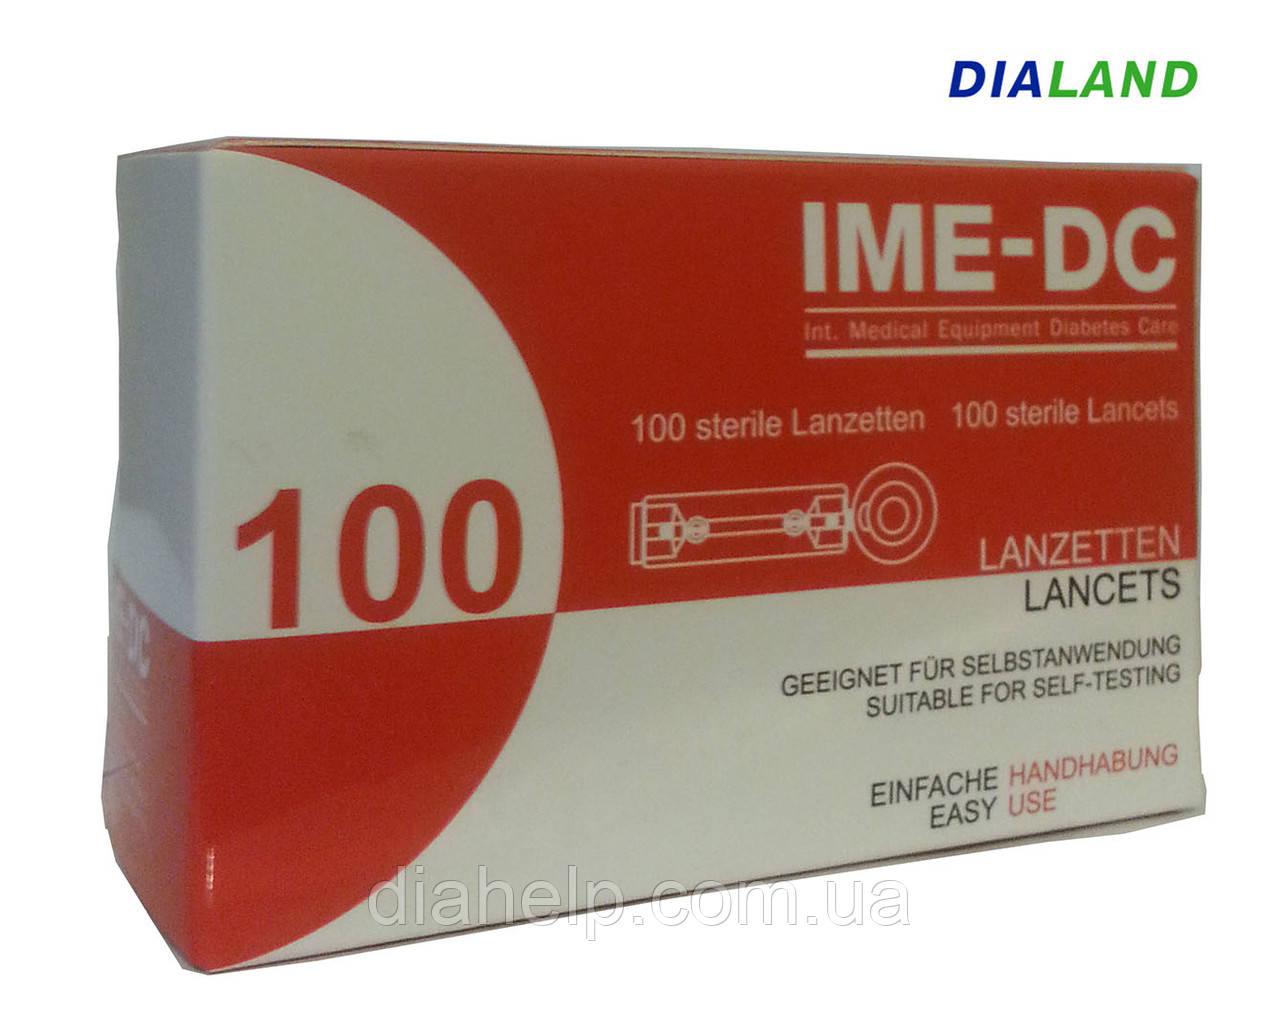 Ланцеты ИМЕ-ДИСИ ( IME-DC ) 100 штук